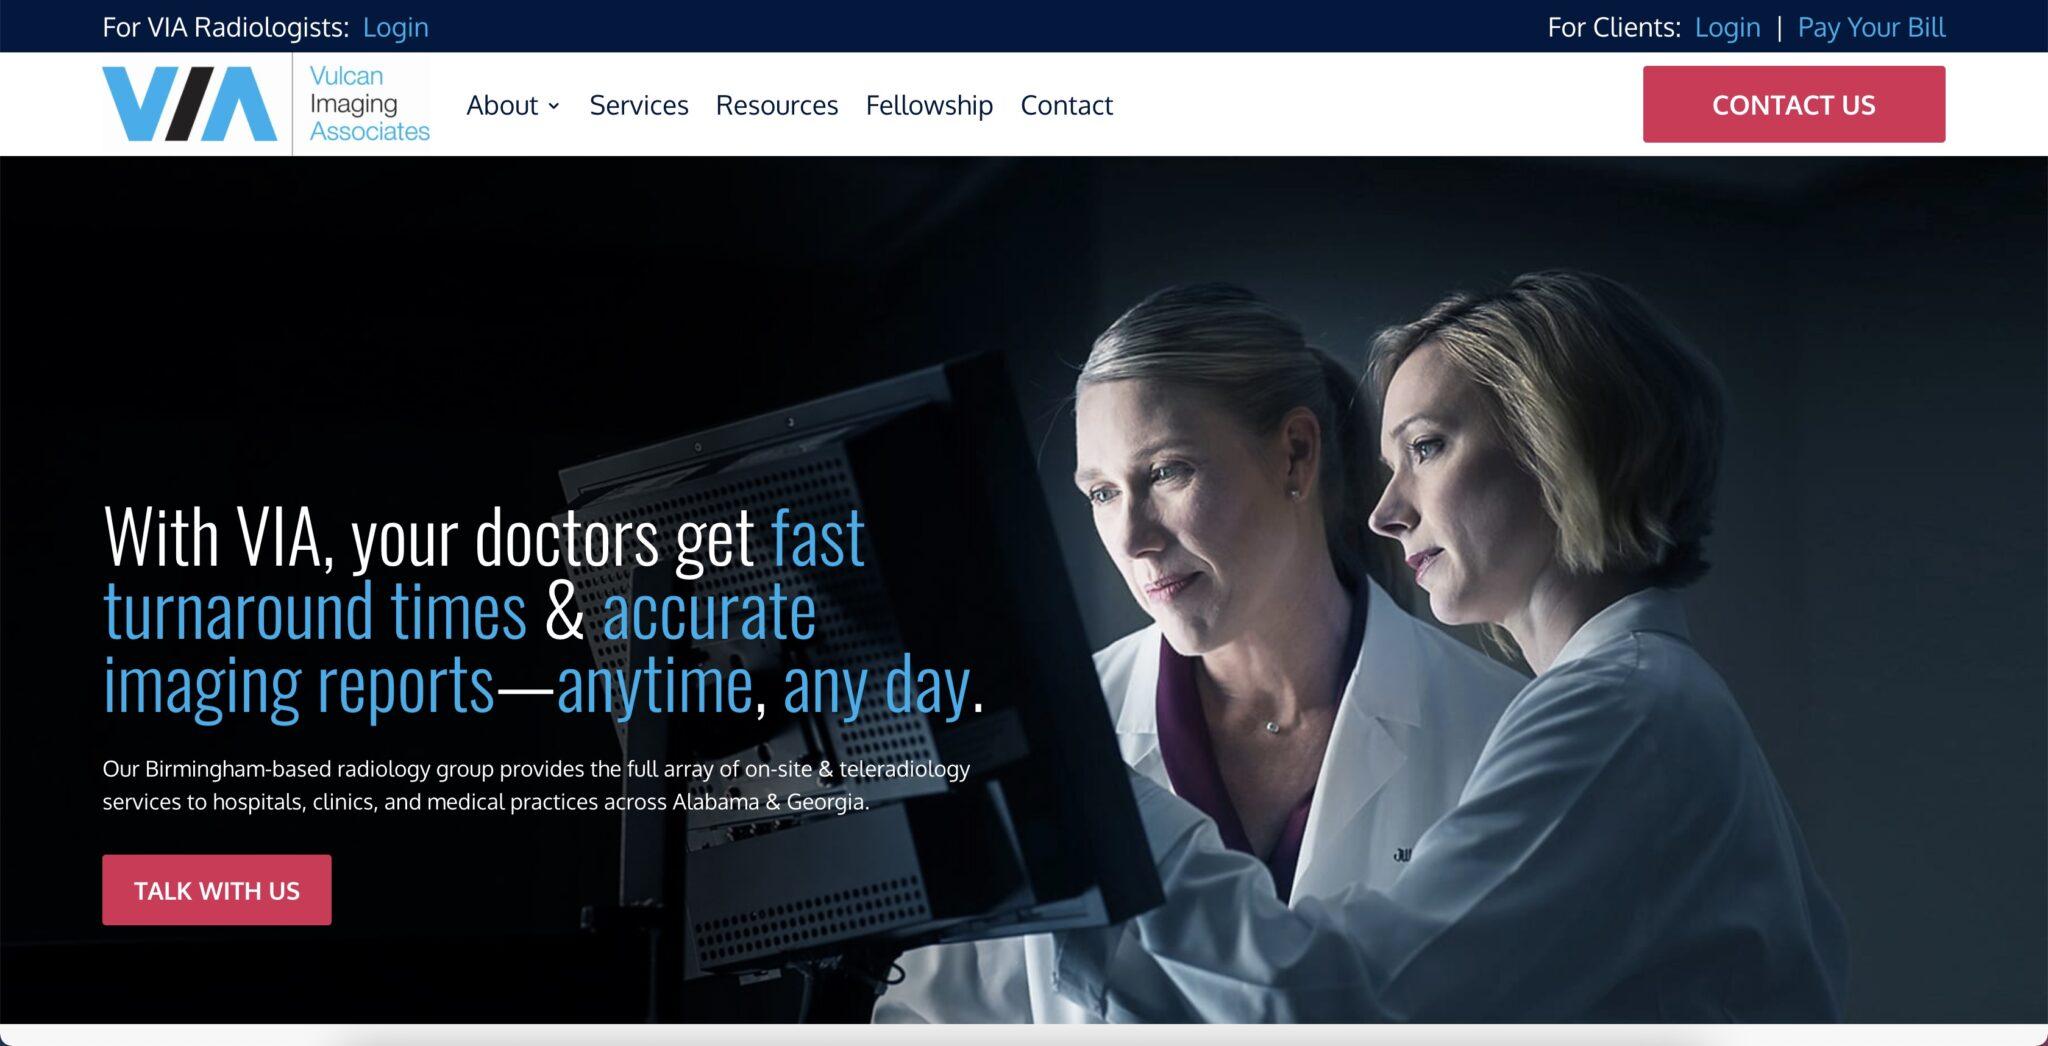 Web Design for Vulcan Imaging Associates Radiology Group